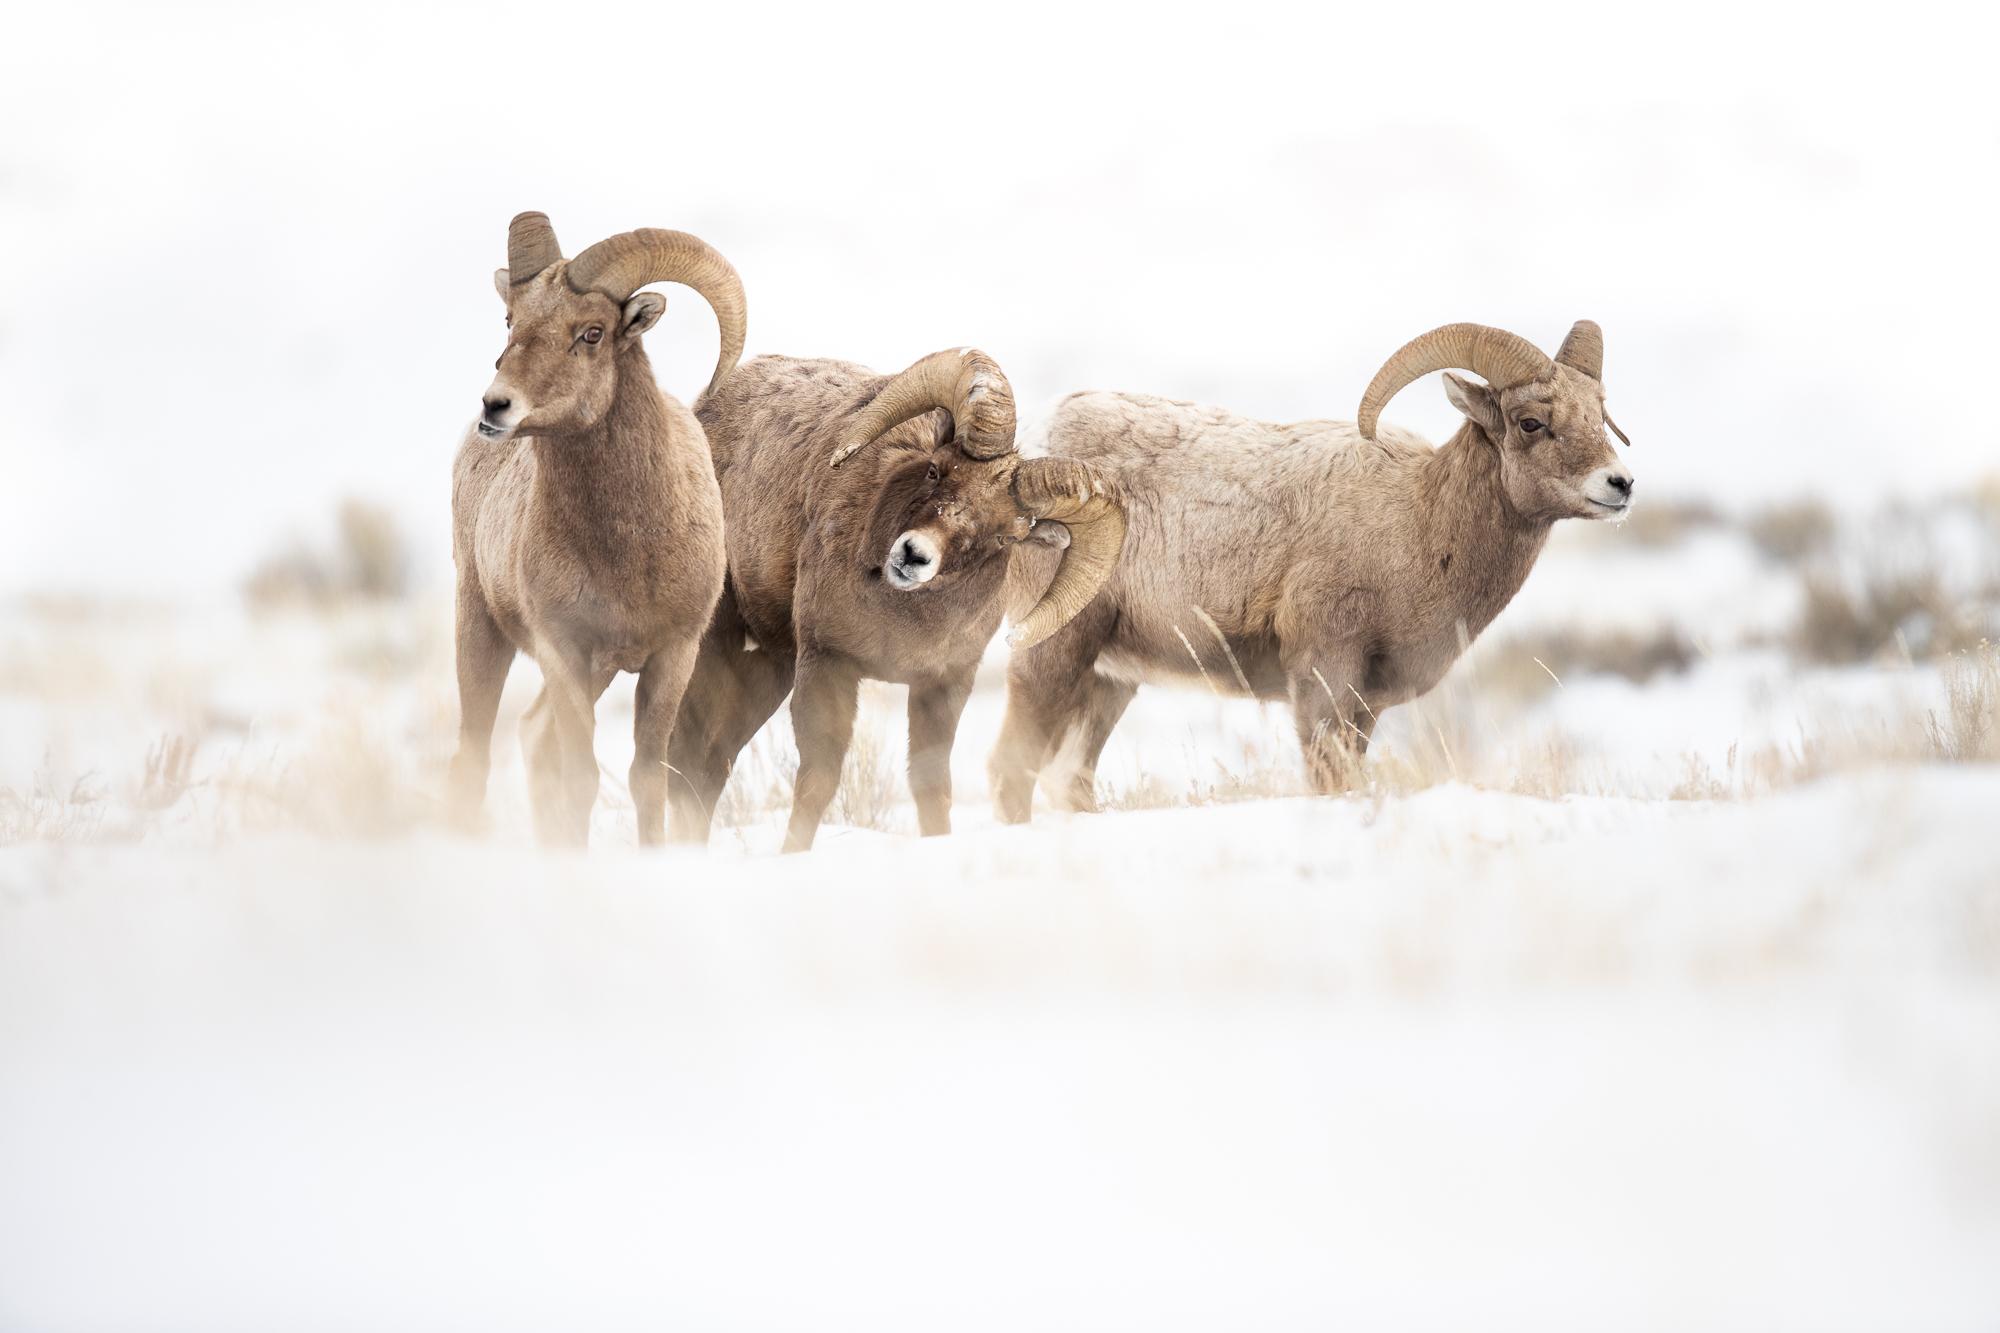 BighornRams